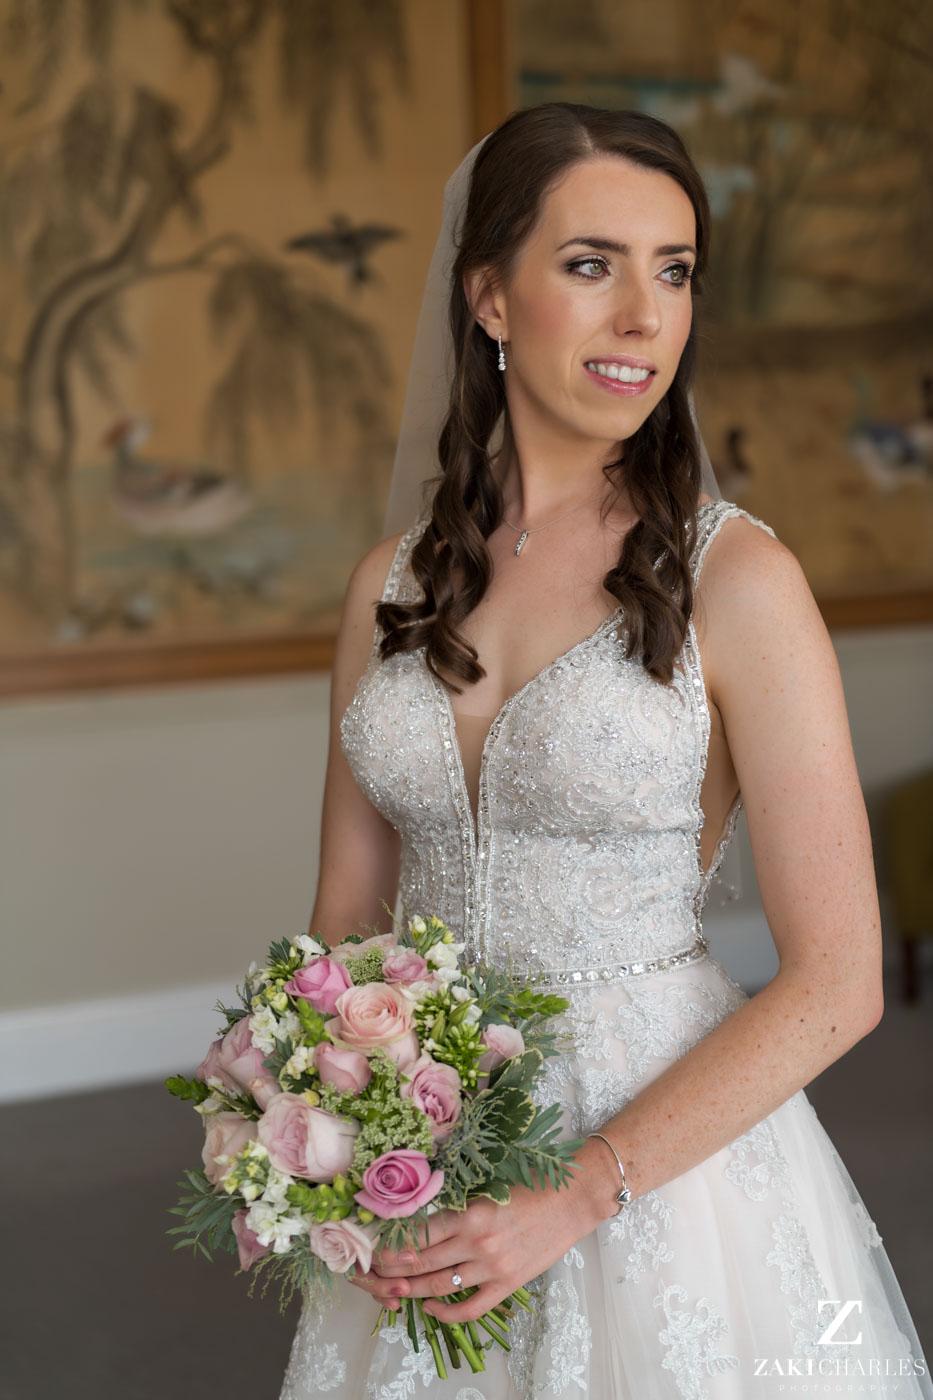 Natural light portrait of the bride at Eynsham Hall